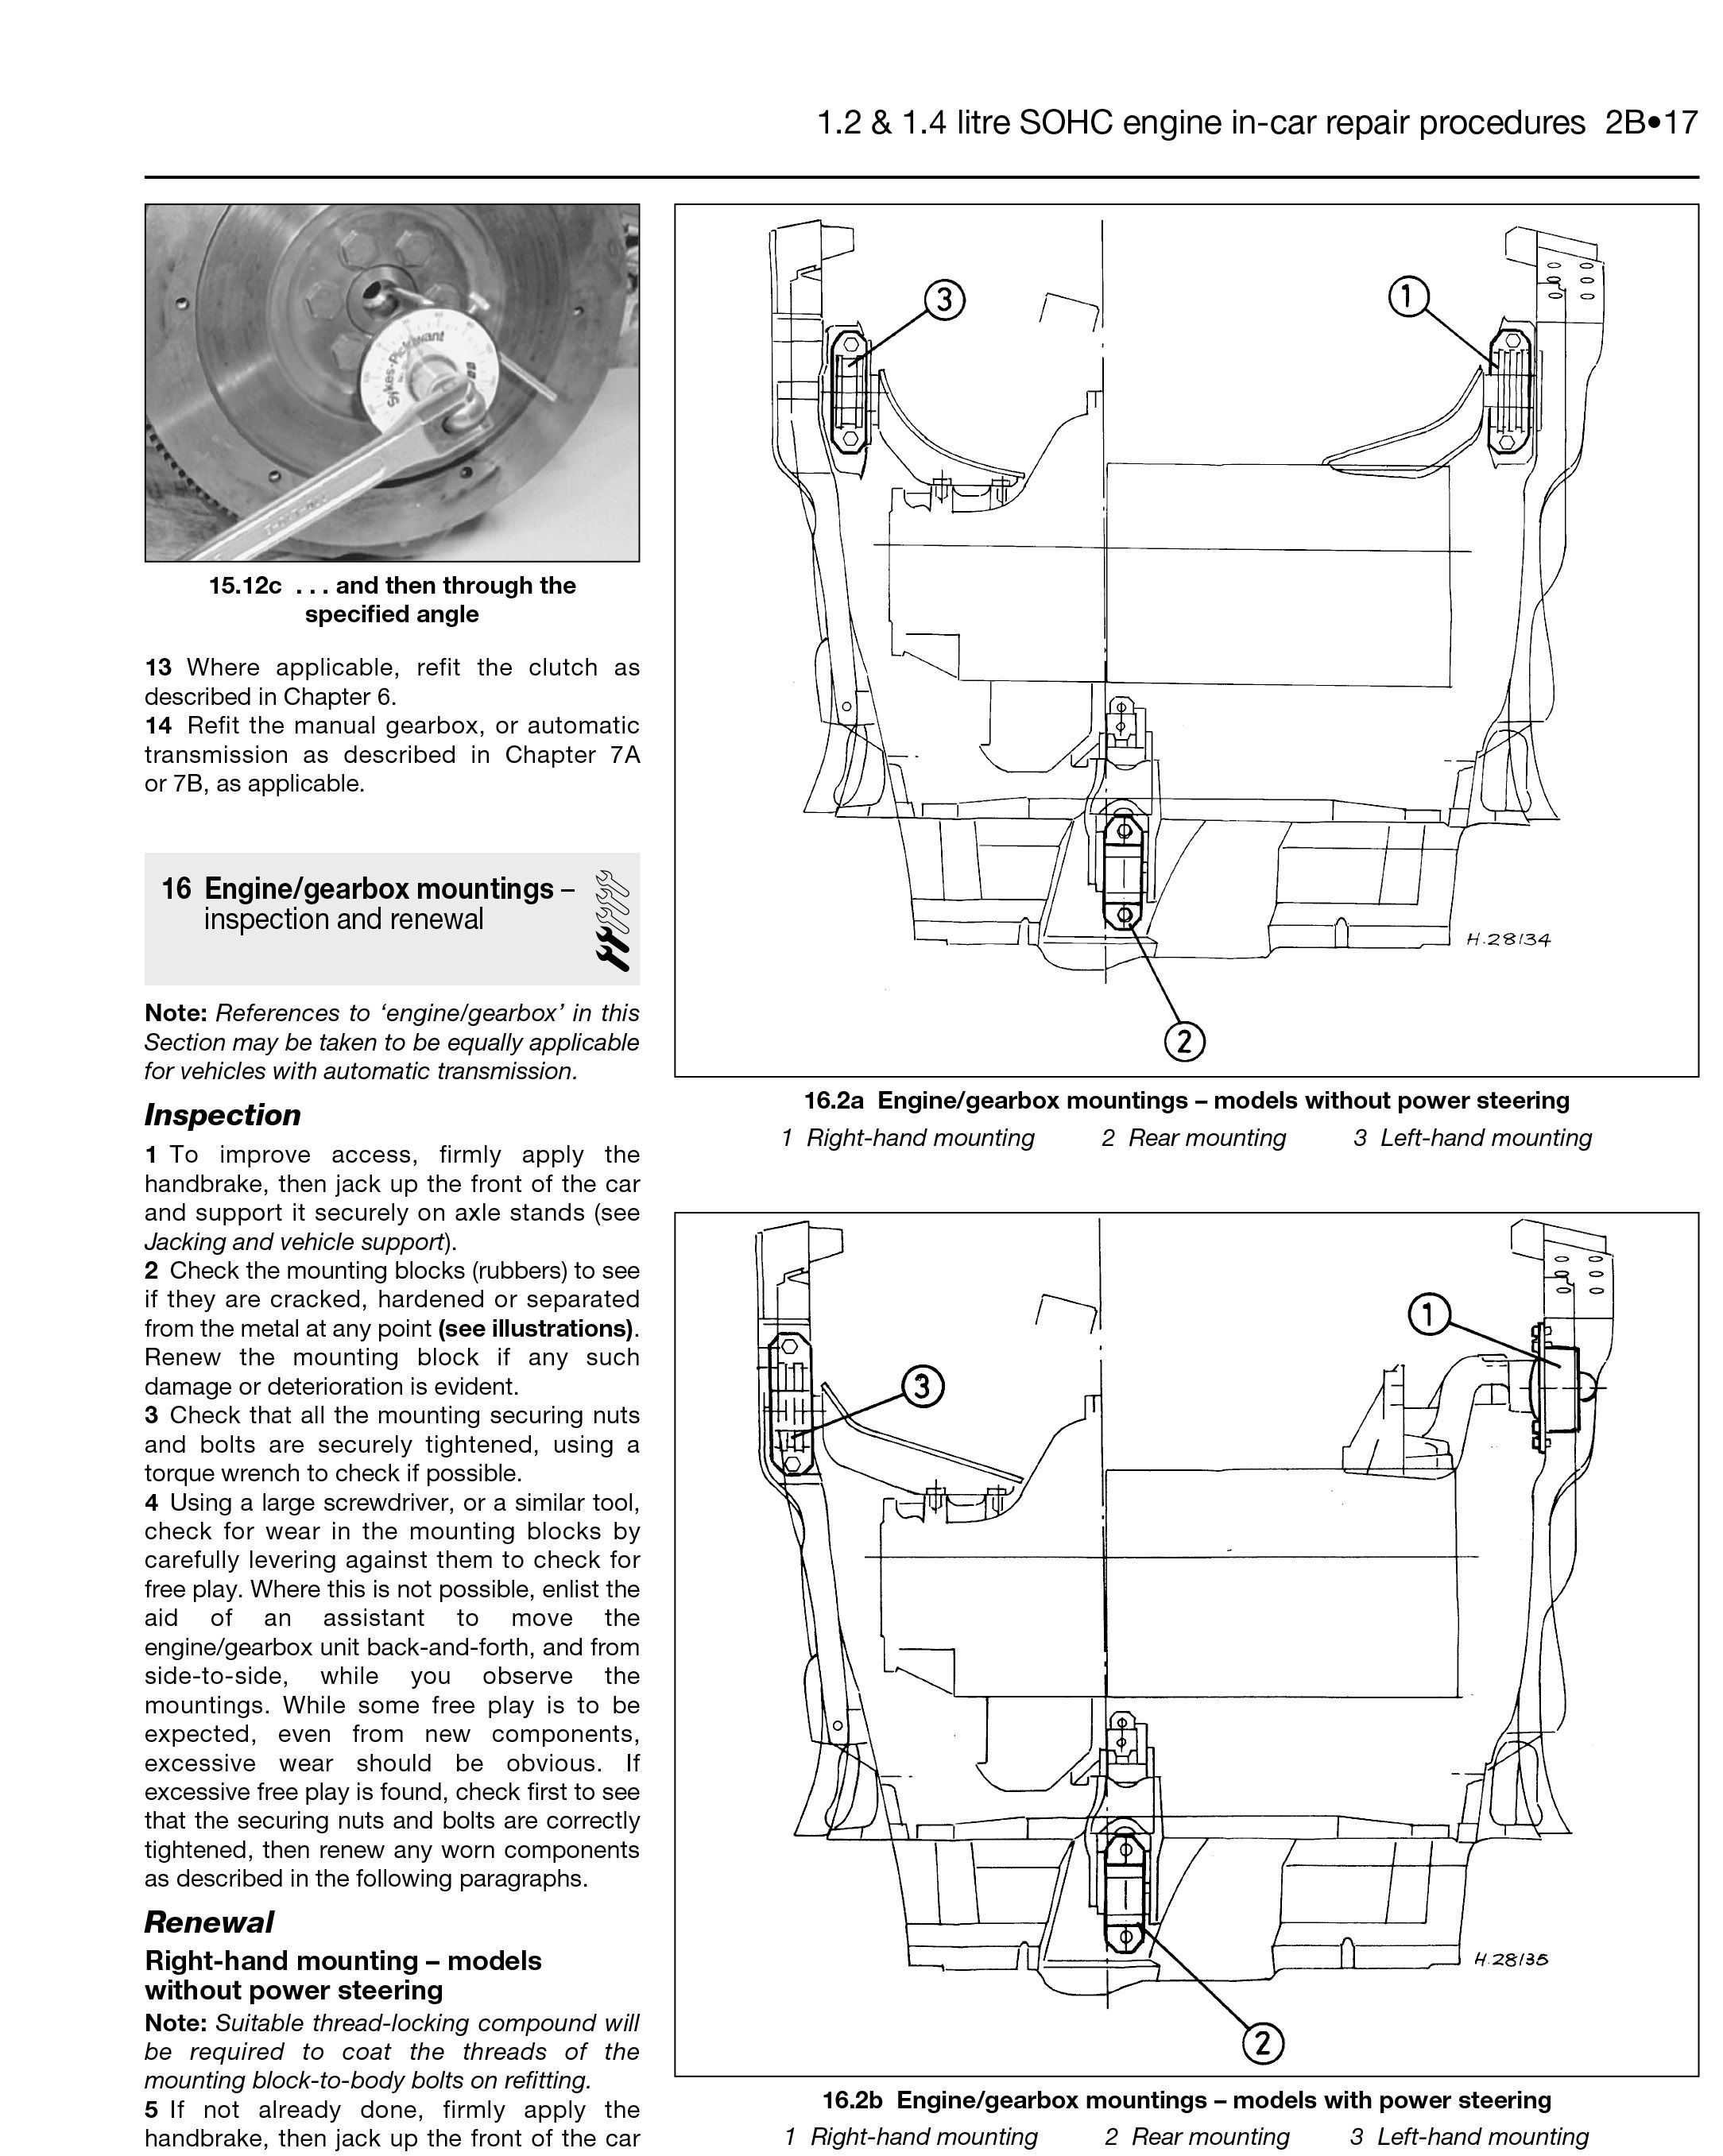 haynes wiring diagram legend wiring diagram diagram electricalhaynes wiring diagram legend wiring diagram diagram  [ 2168 x 2713 Pixel ]